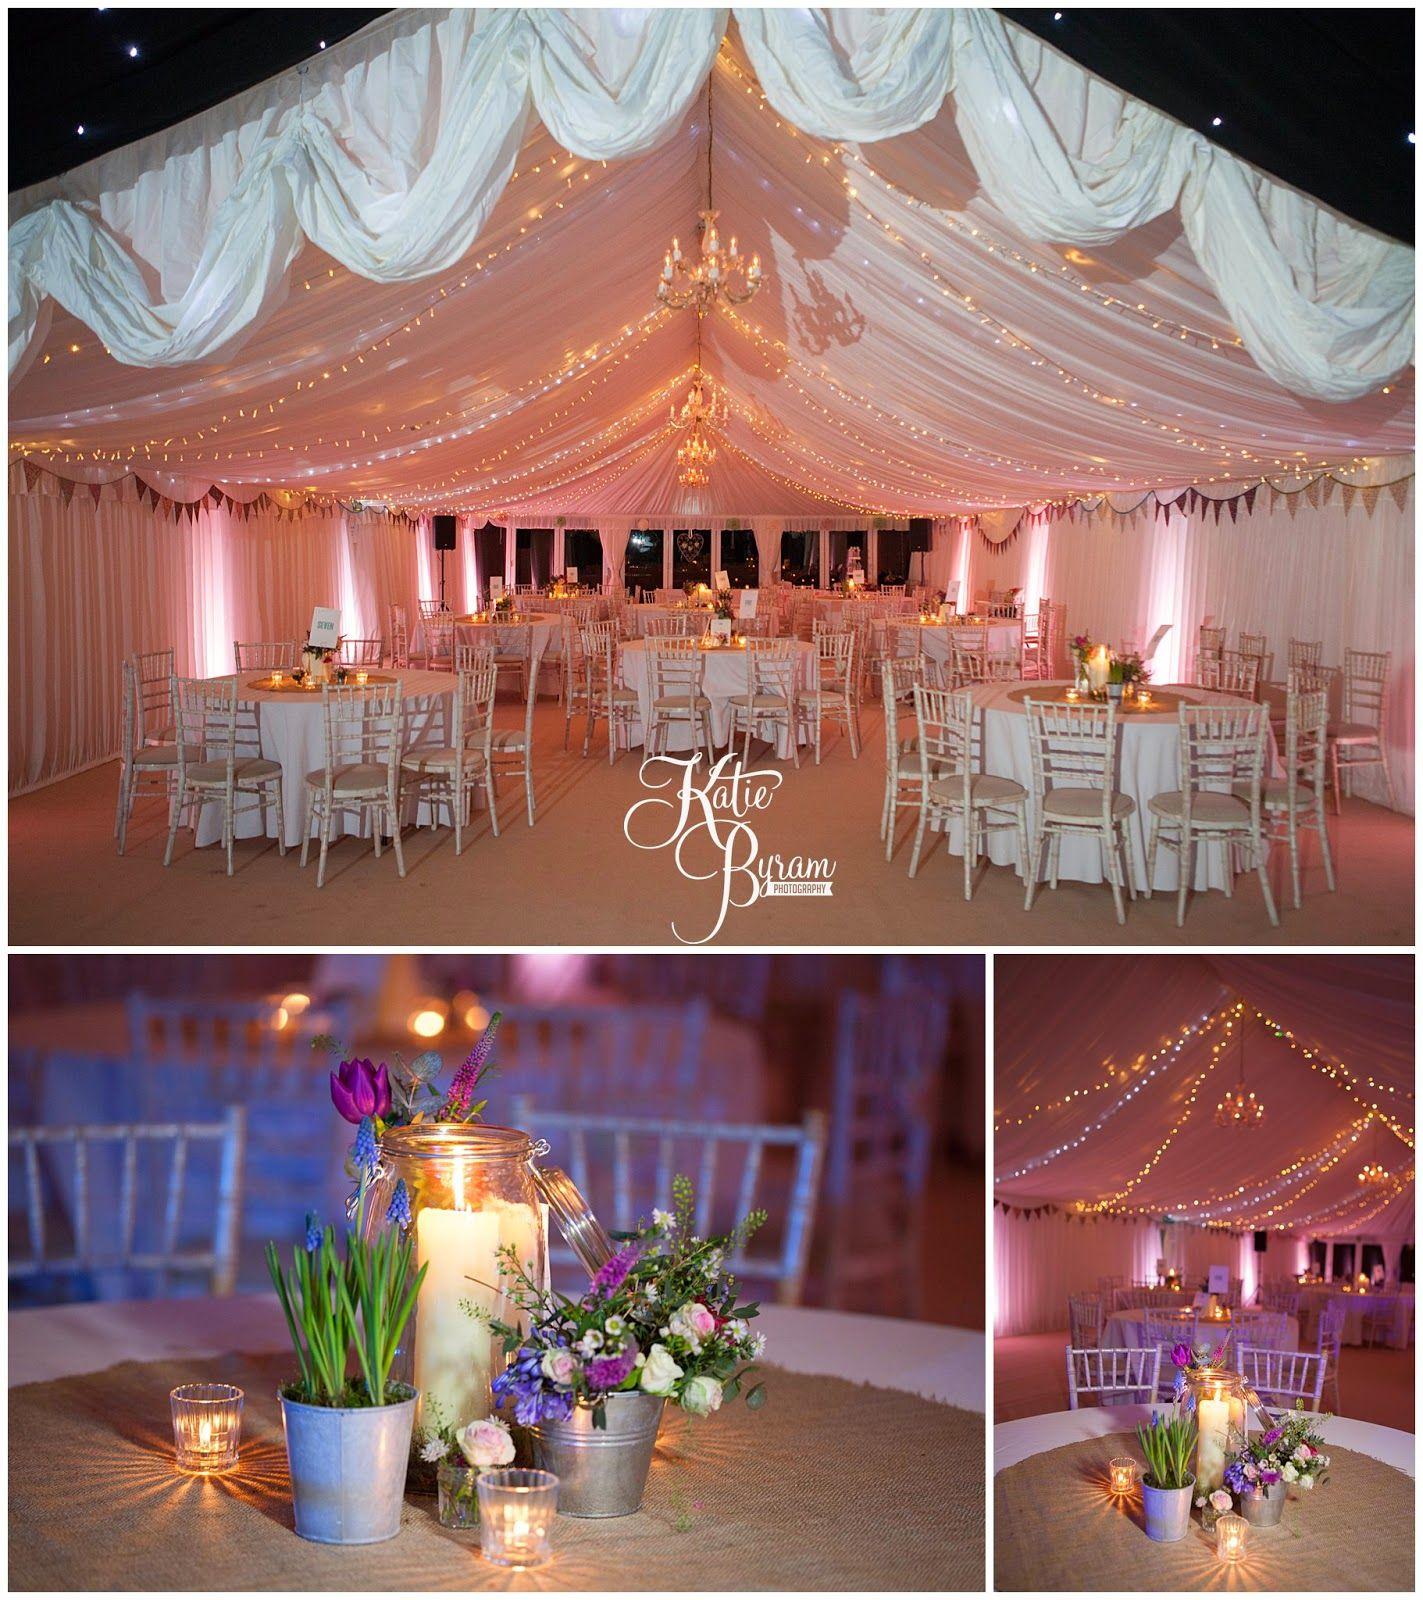 Priory Cottages Wedding Wetherby Yorkshire Photographer Venue Jenny Packham